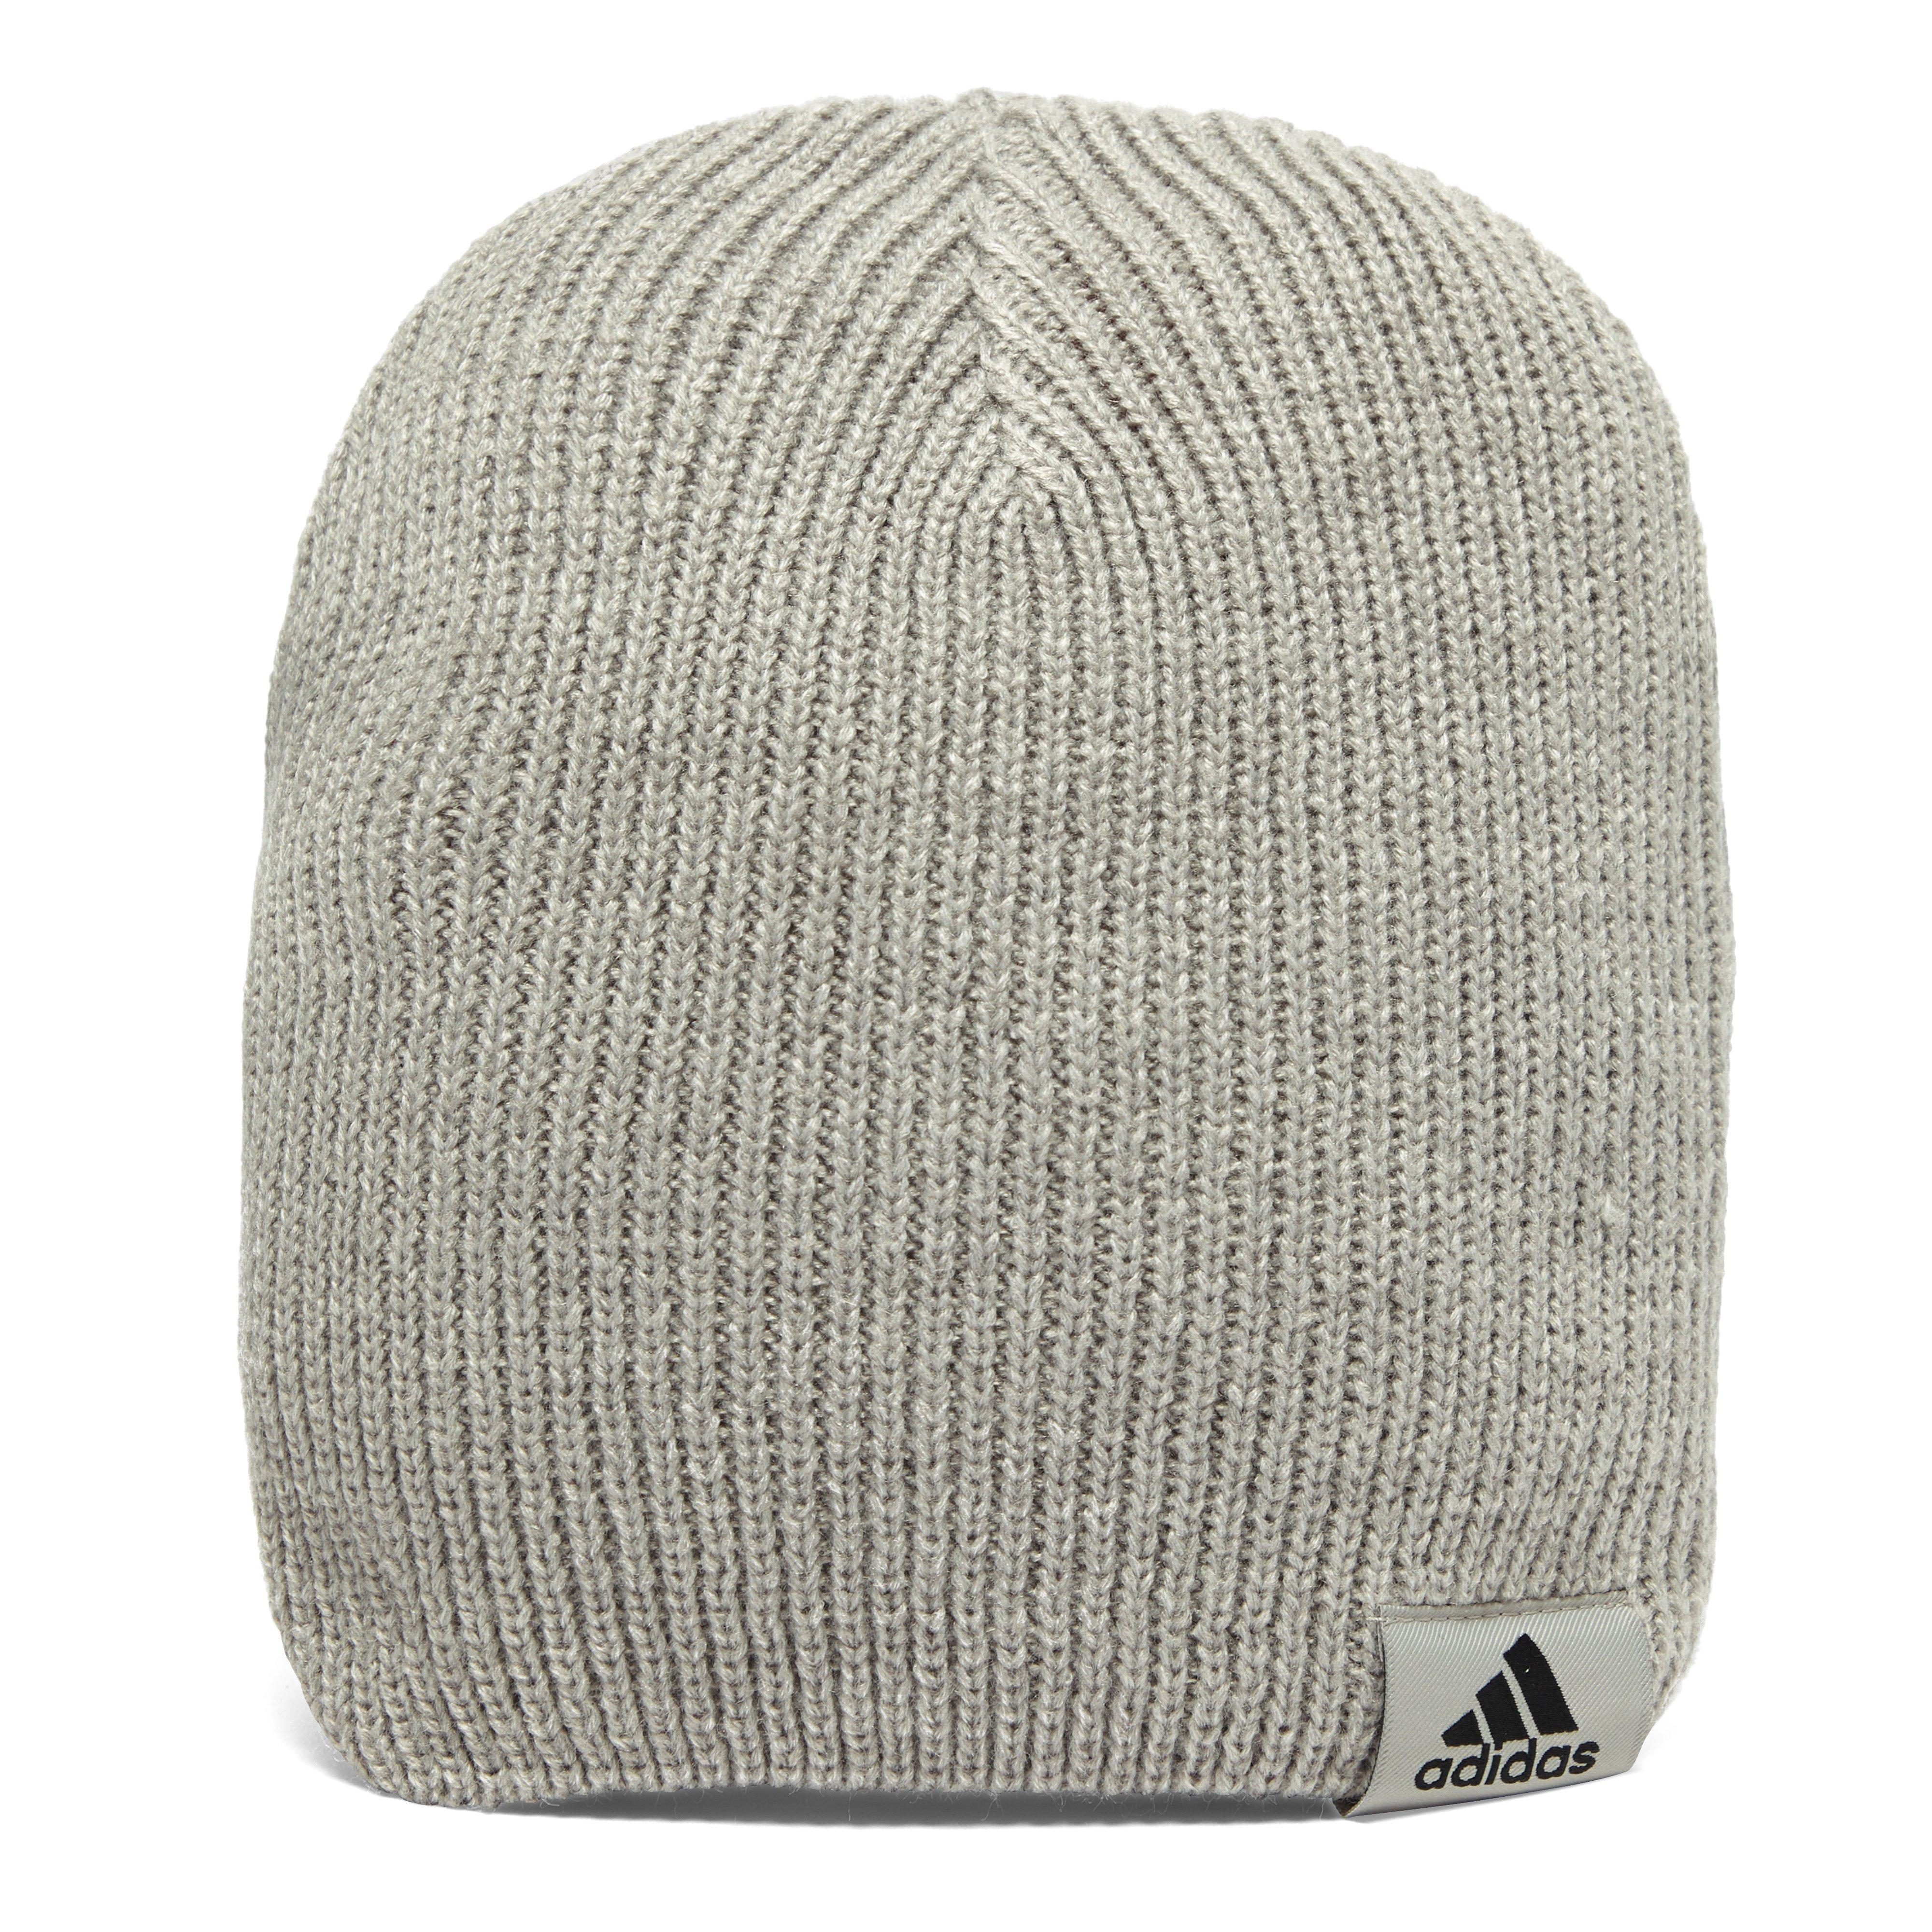 d9ee1126dae Adidas Performance Beanie Hat